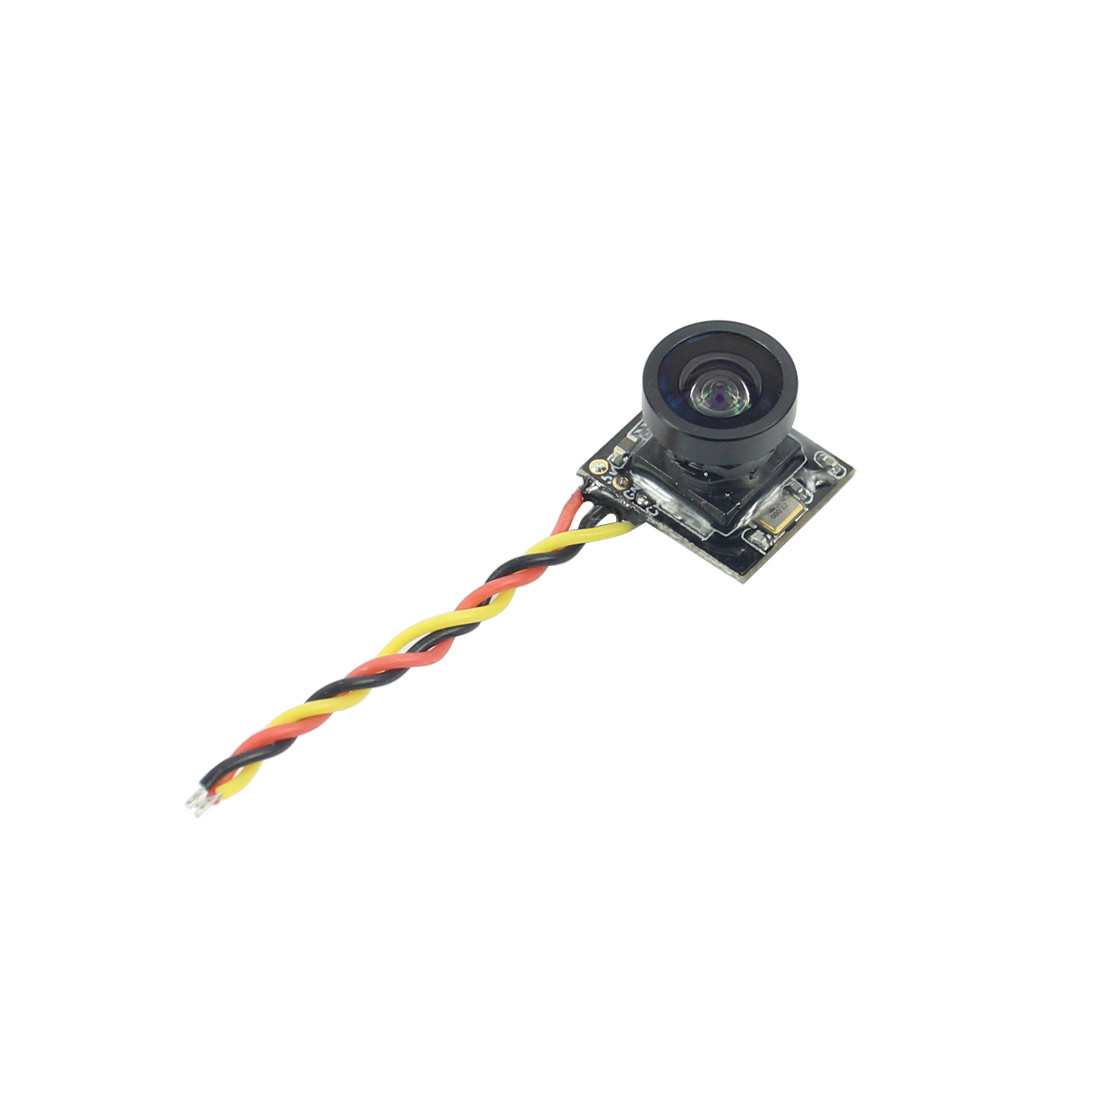 LDARC 199C Mini Camera for TINY 6X FPV Racing Drone RC Racer Quadcopter 1.9g|FPV| |  - title=